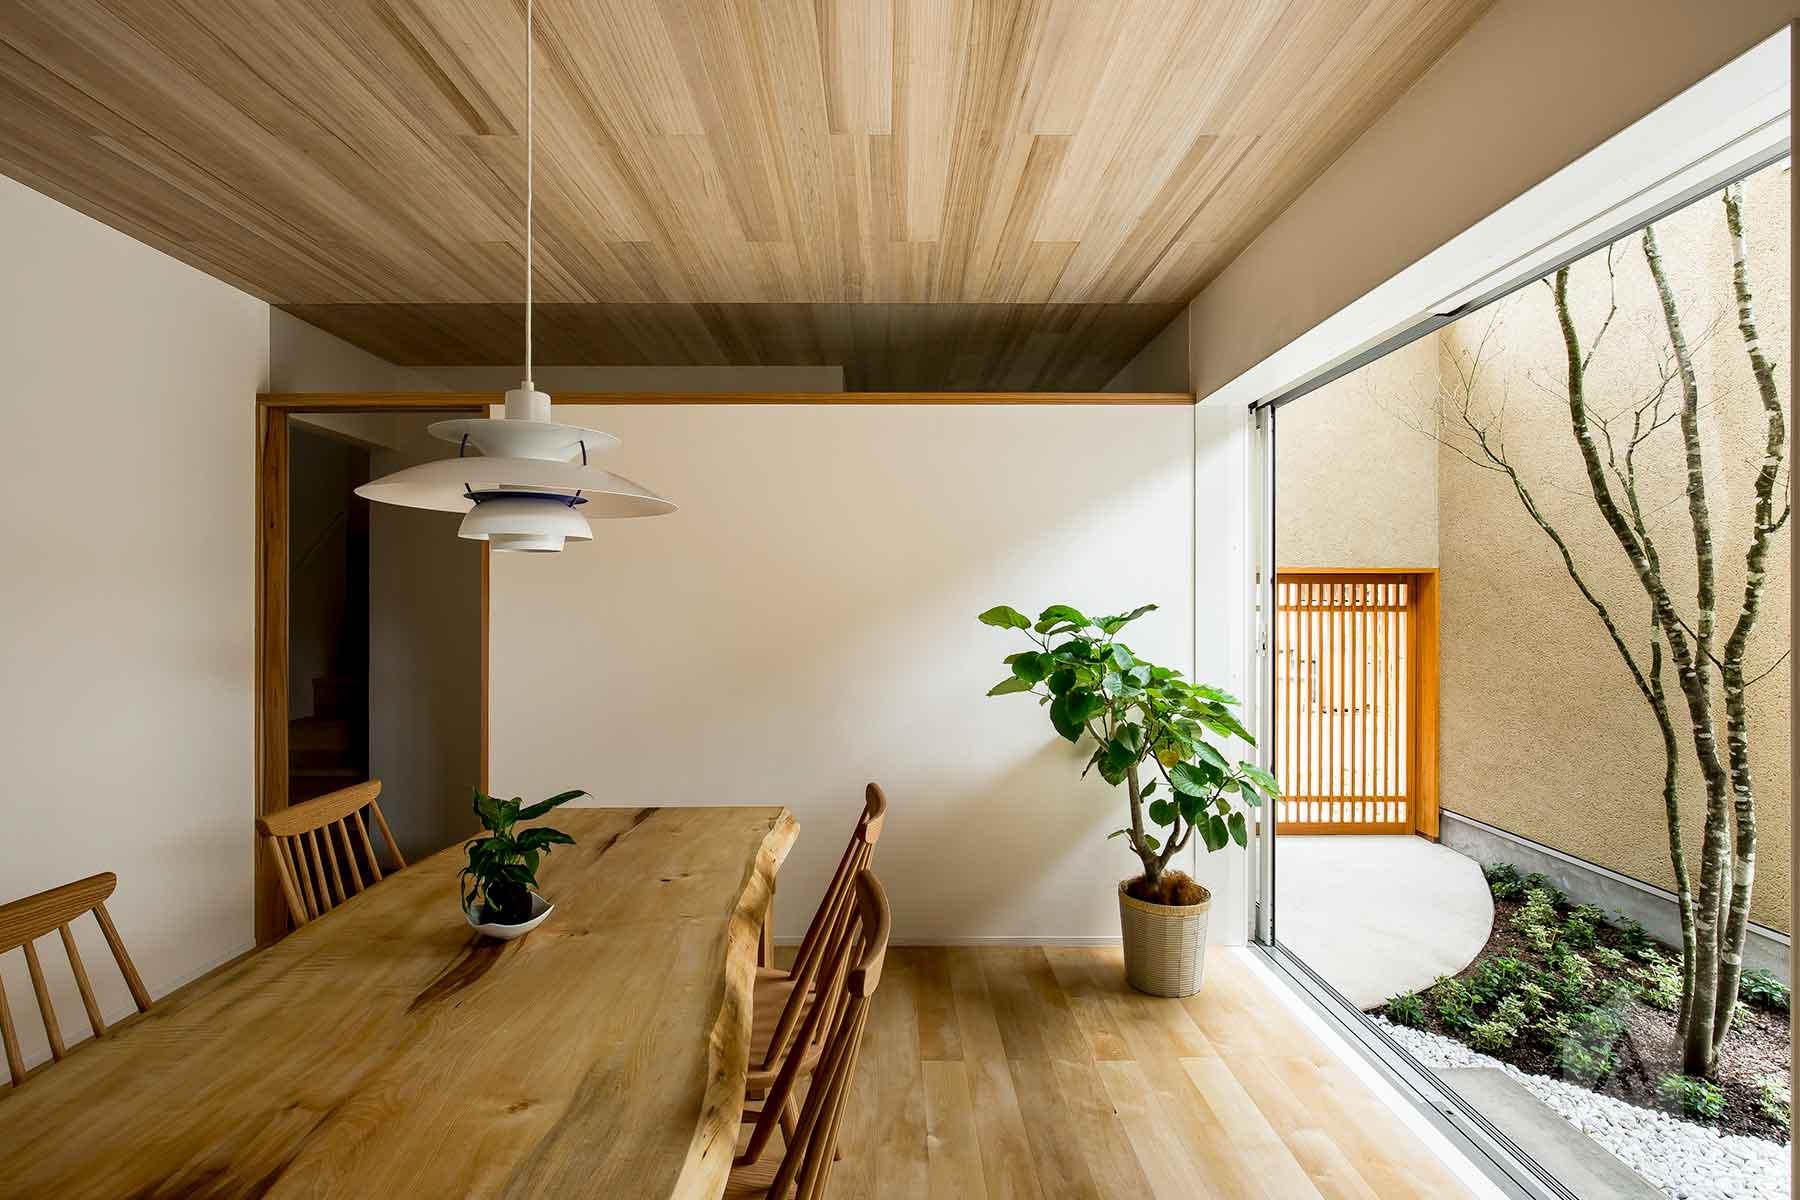 Architecture-by-Hearth-Architects,-Japan.--Photography-by-Yuta-Yamada-09.jpg